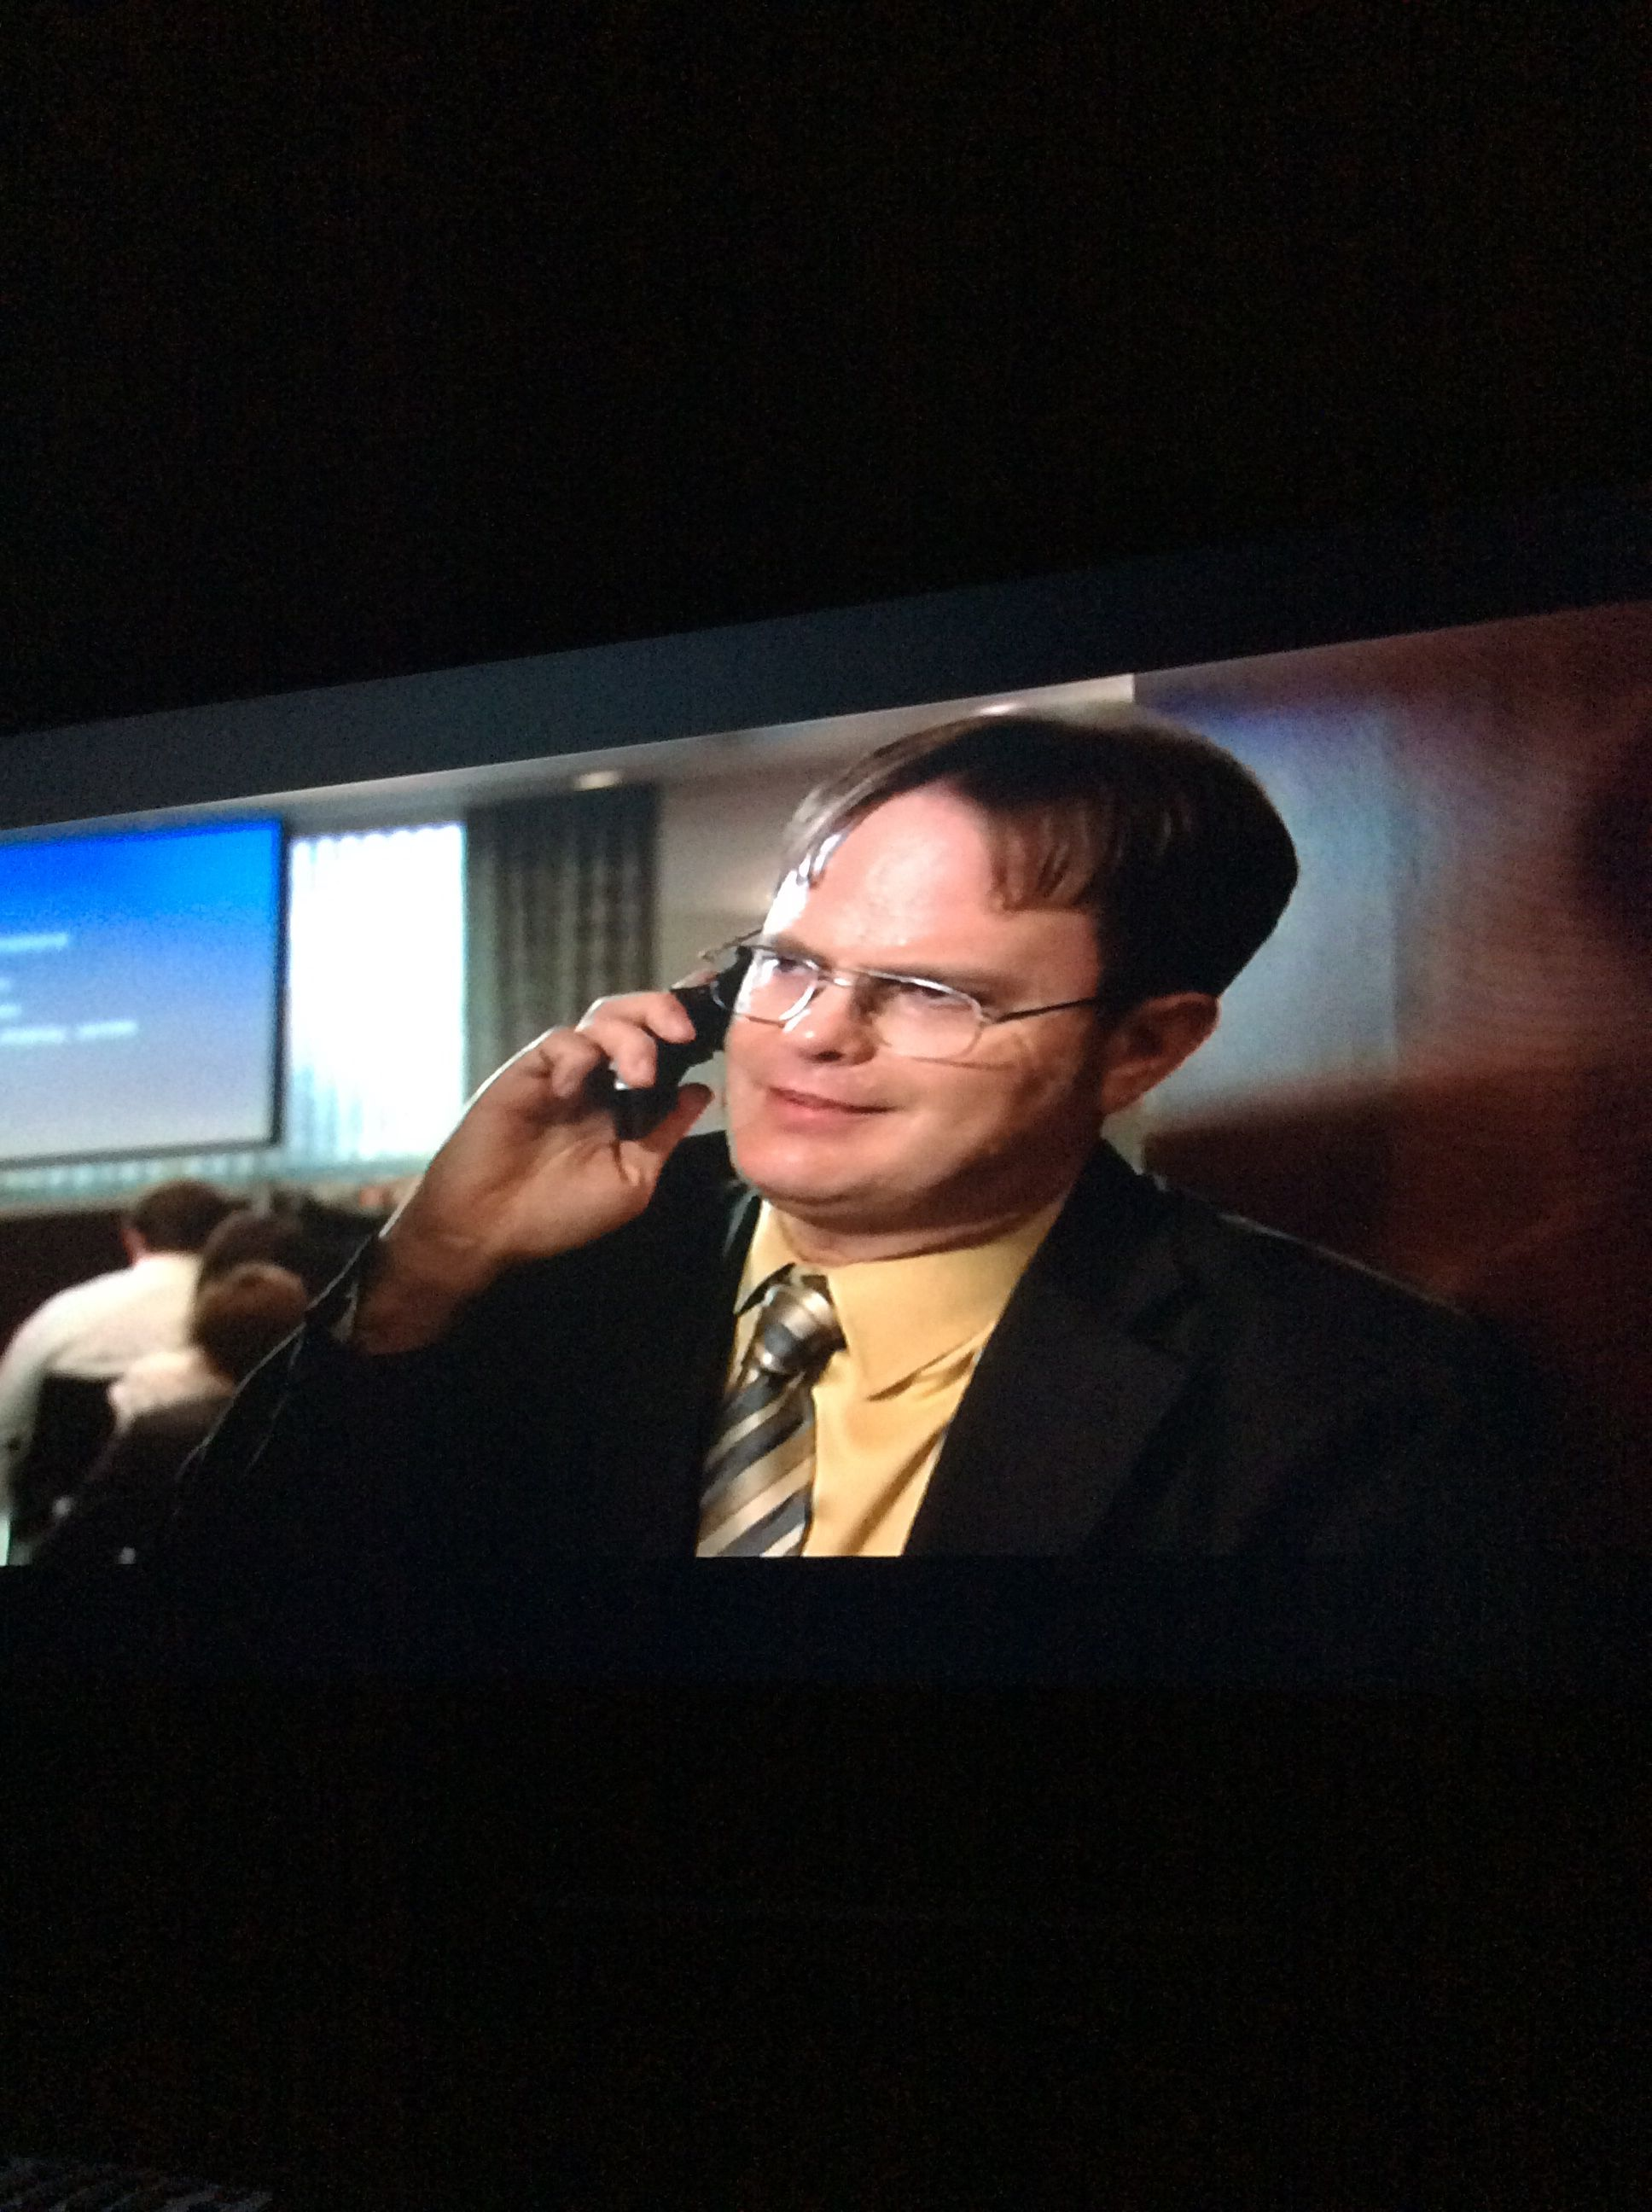 Dwight: Tallahassee